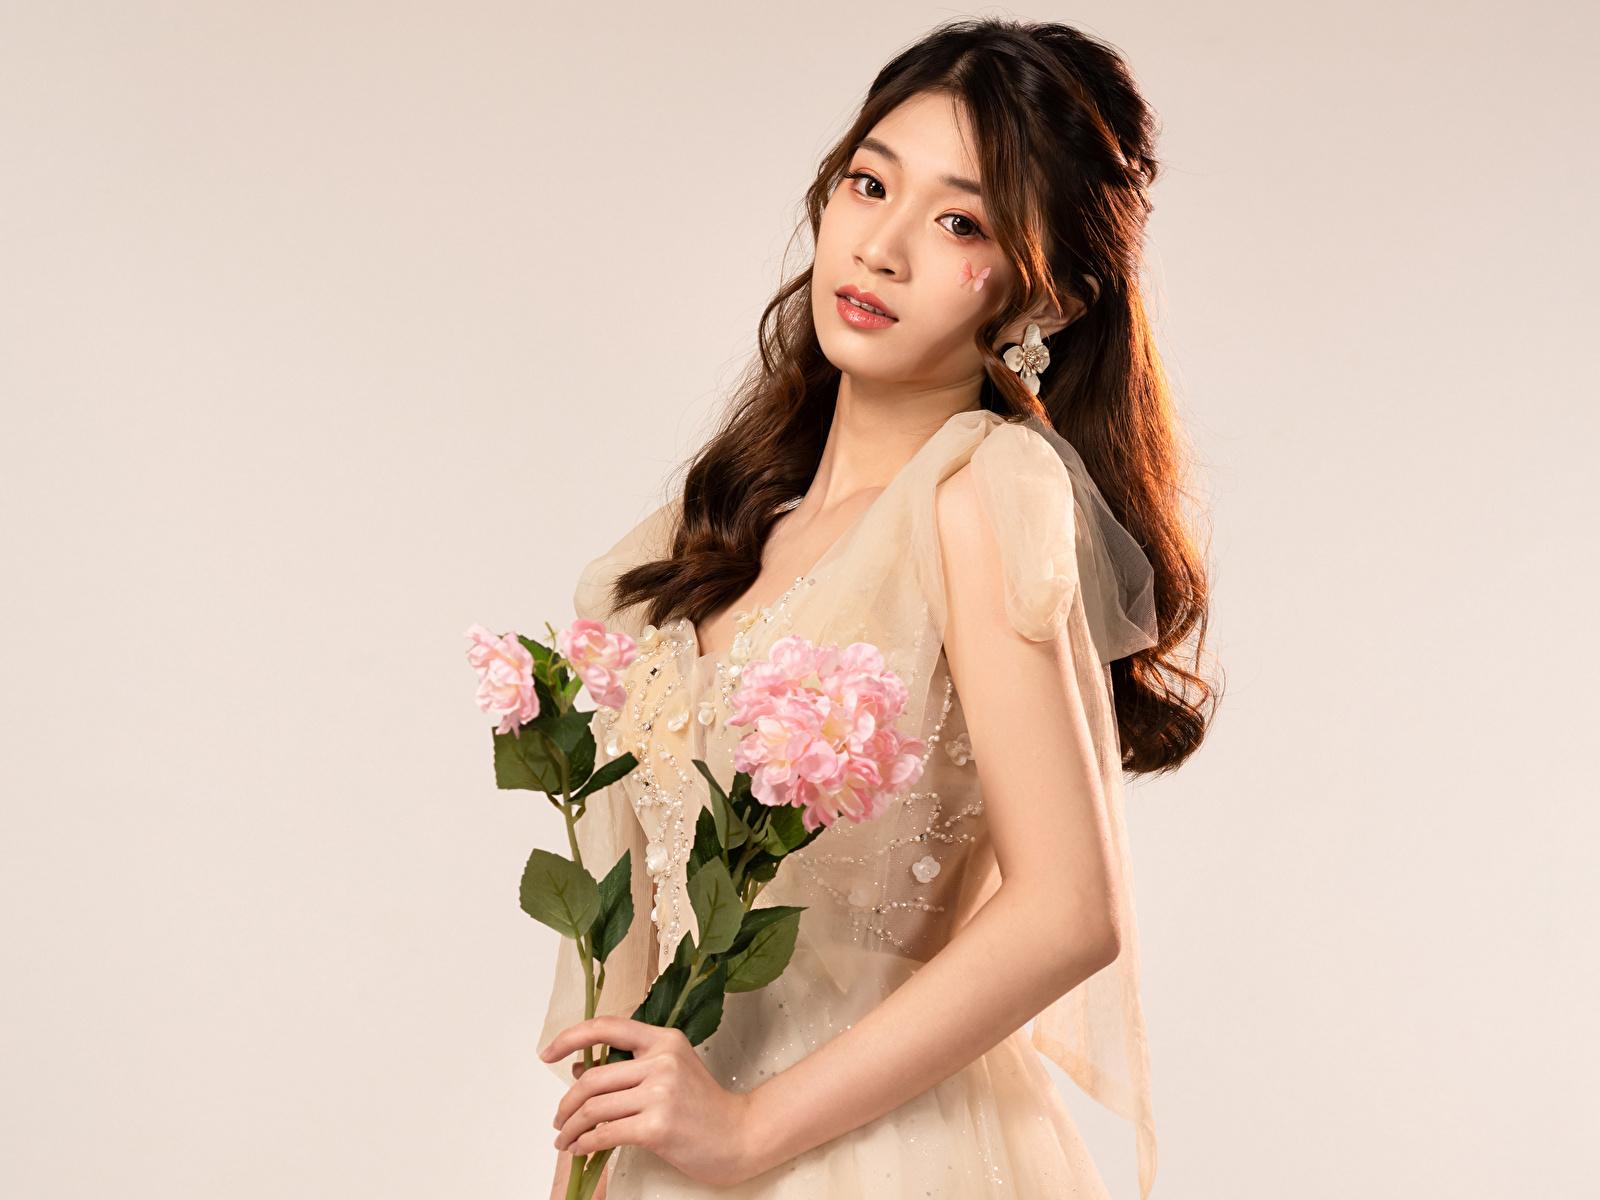 Fotos Sträuße junge Frauen Asiatische Blick 1600x1200 Blumensträuße Mädchens junge frau Asiaten asiatisches Starren